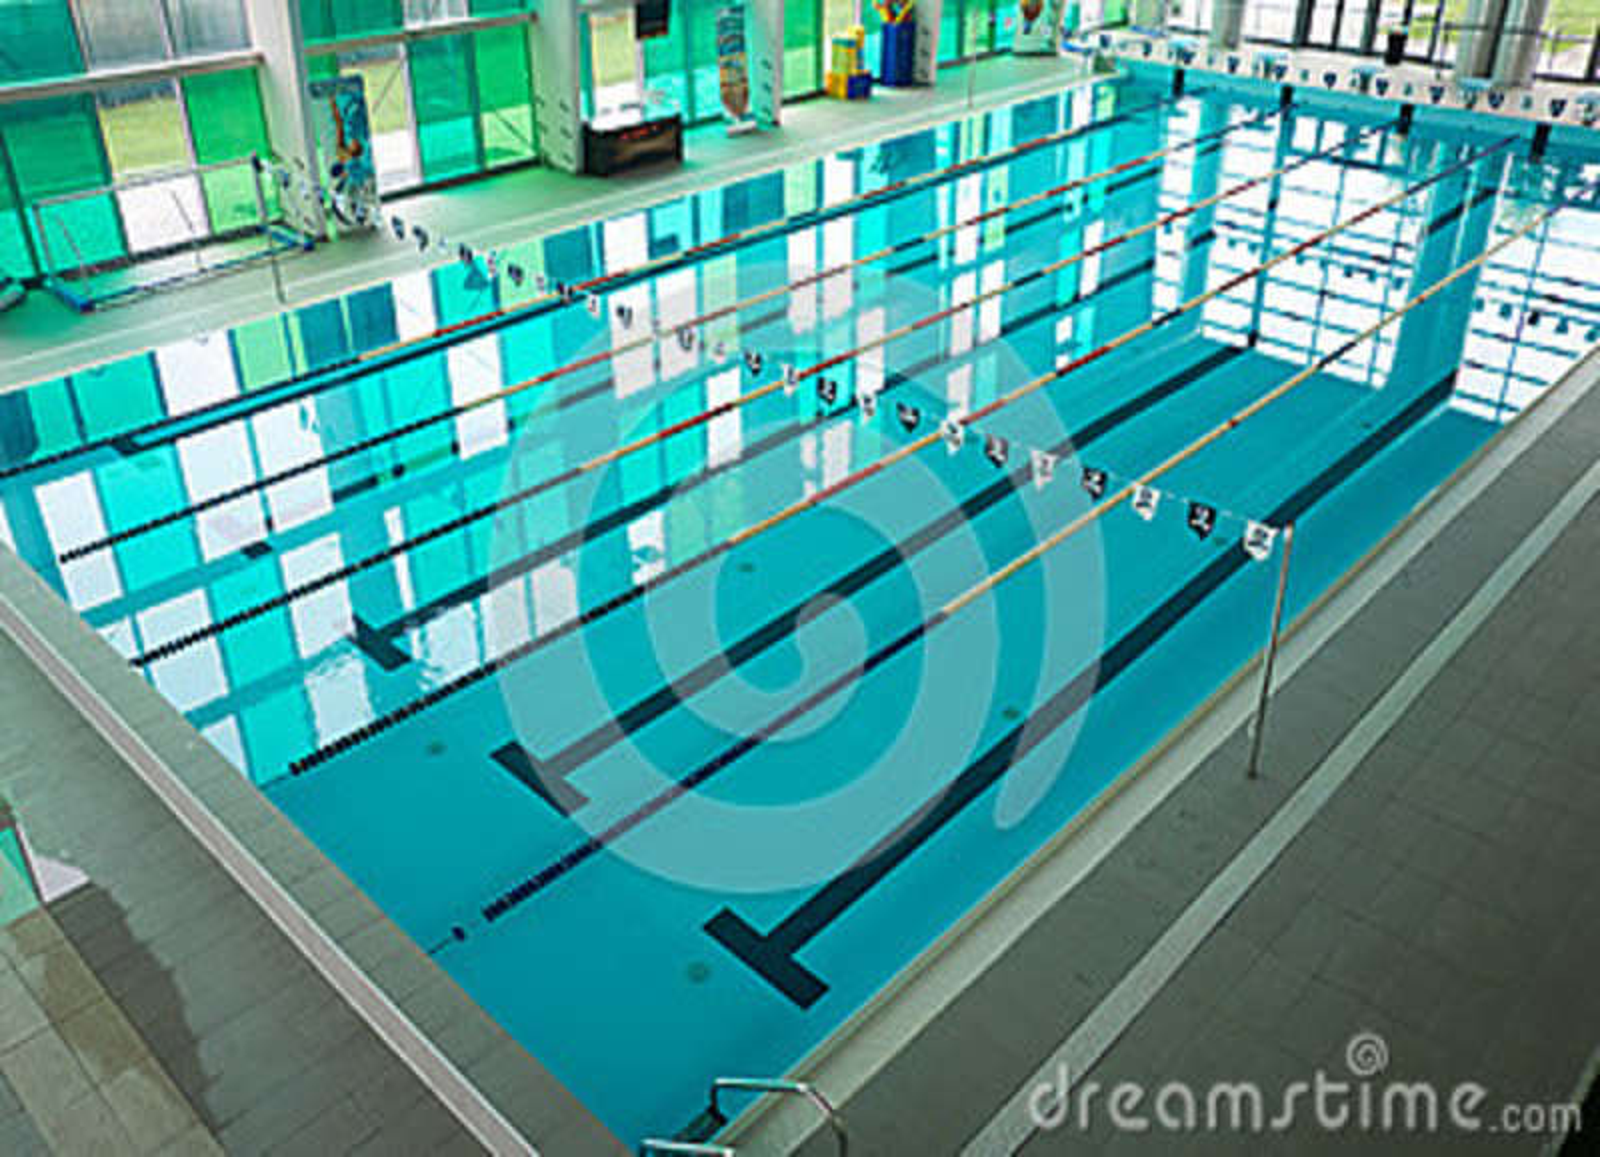 Public swimming pool editorial stock image image of lane 82873409 for Alderwood pool public swim times